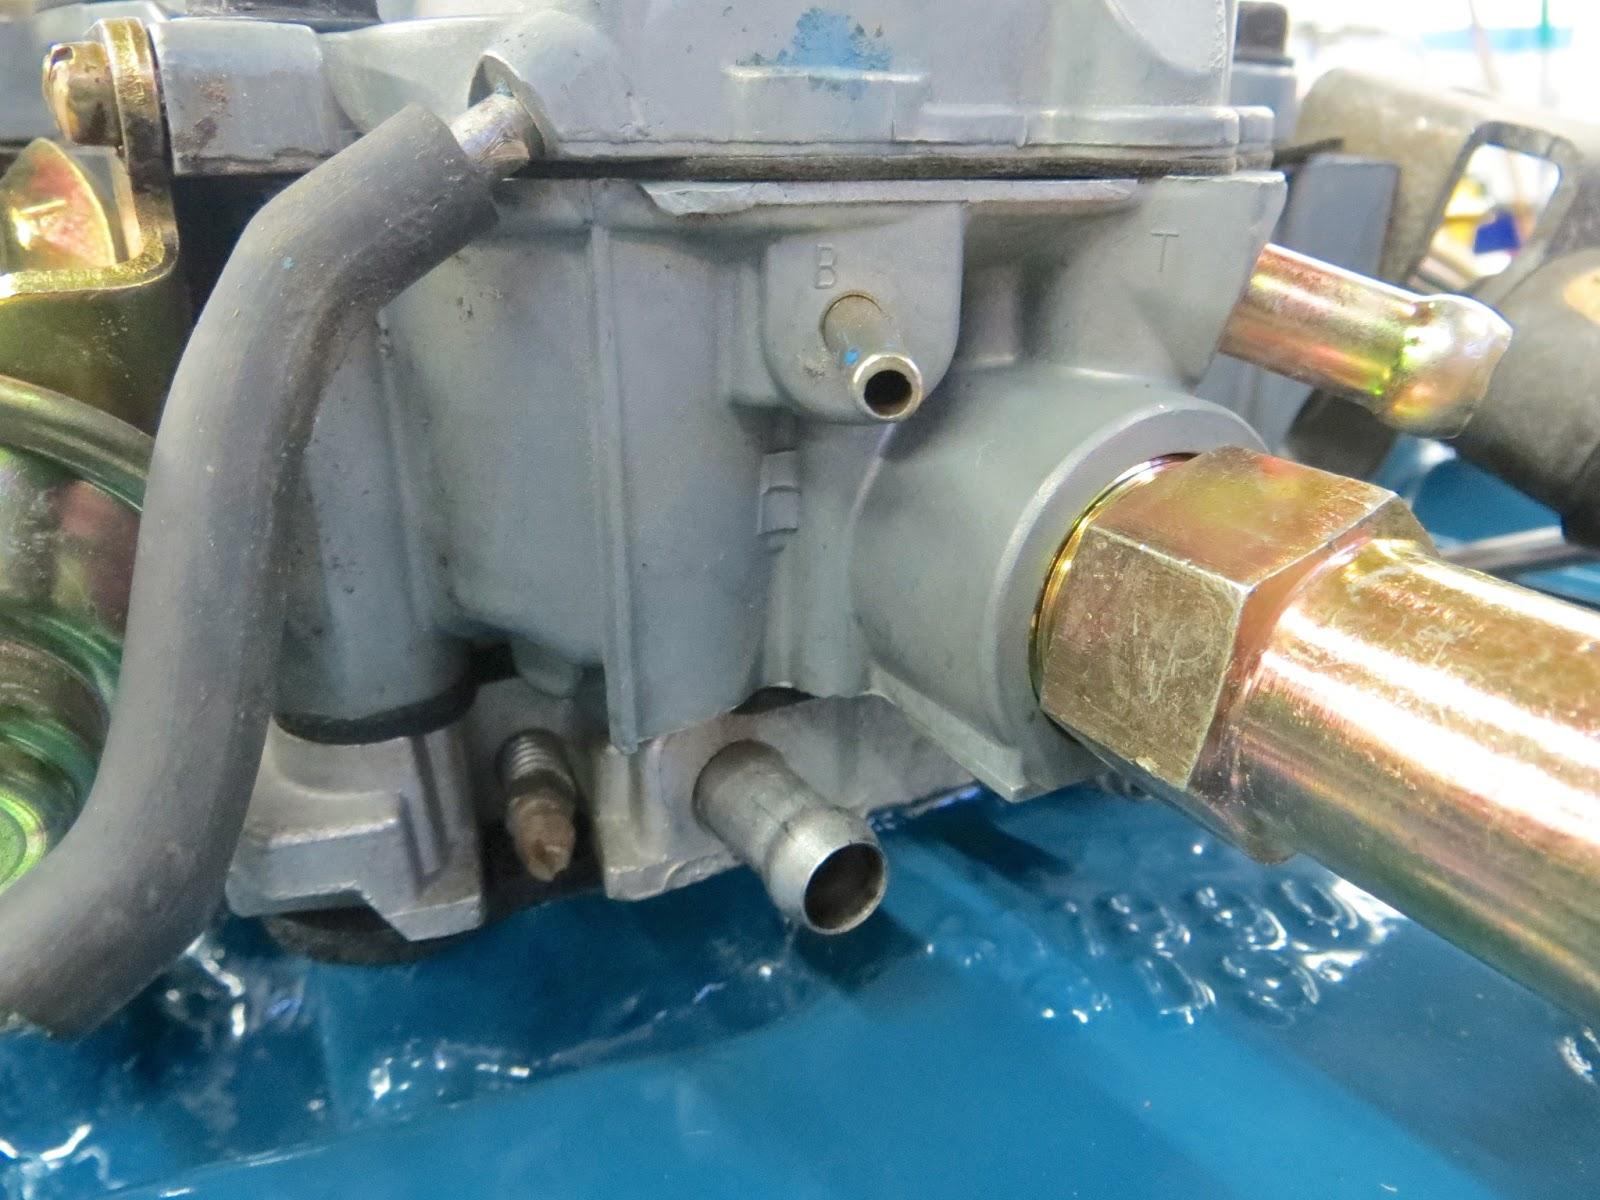 hight resolution of small port b manifold vacuum large upper port t carburetor bowl vent and large lower port manifold vacuum for the pcv valve